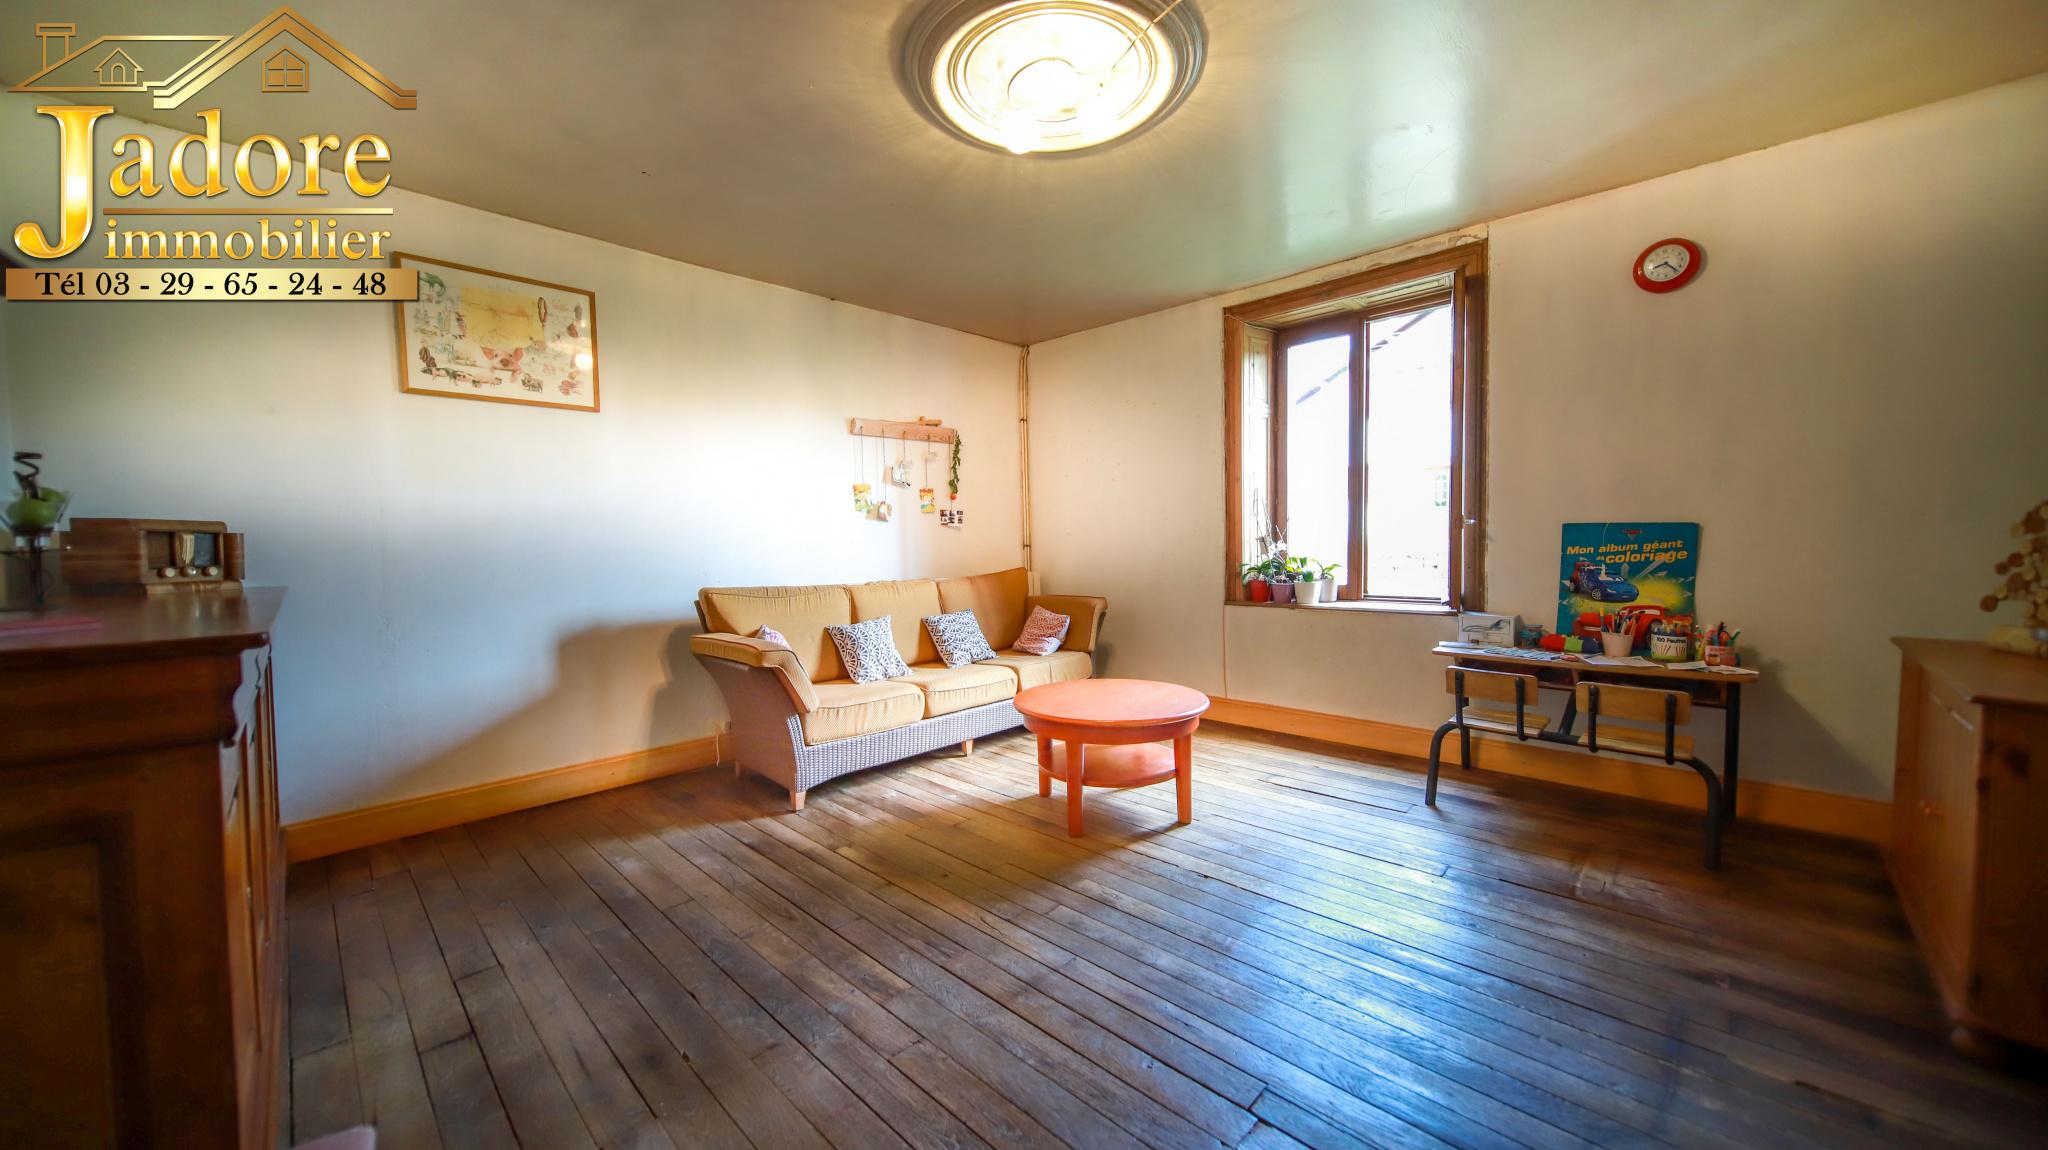 maison/villa à vendre gerardmer